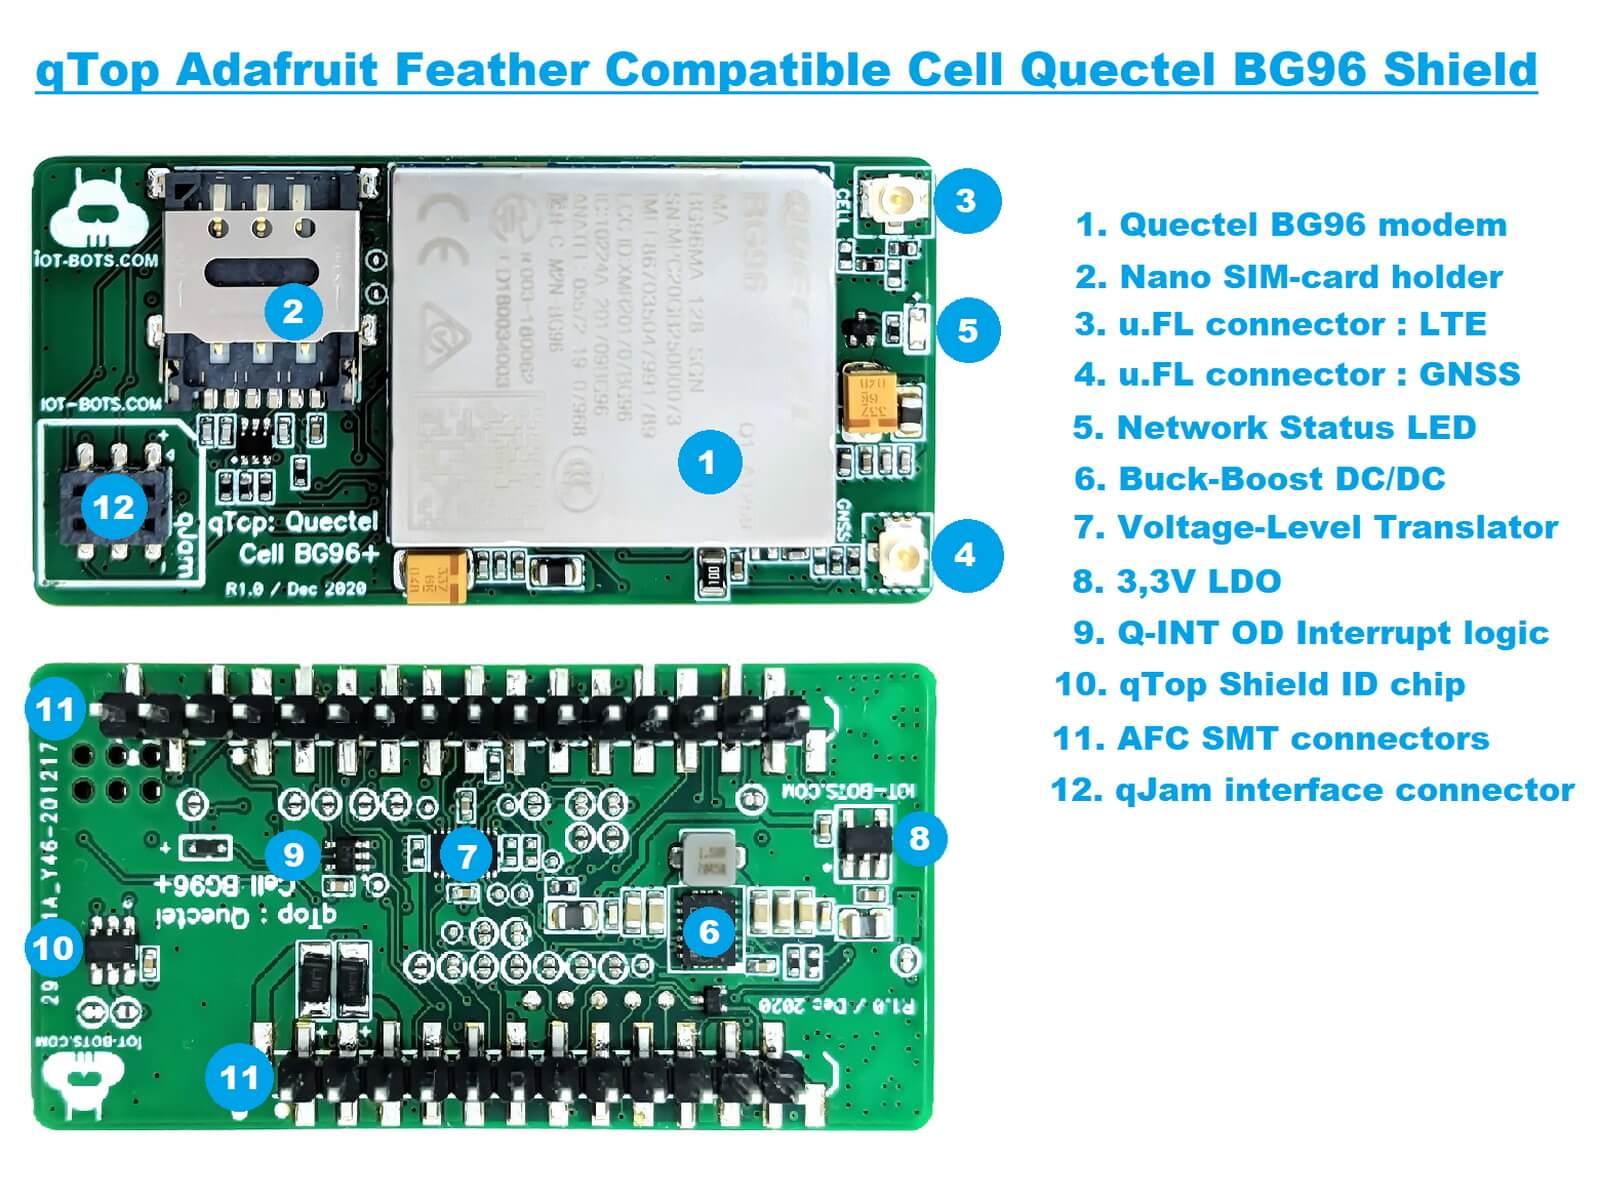 iotbotscom-qtop-cell-quectel-bg96-afc-functional-components